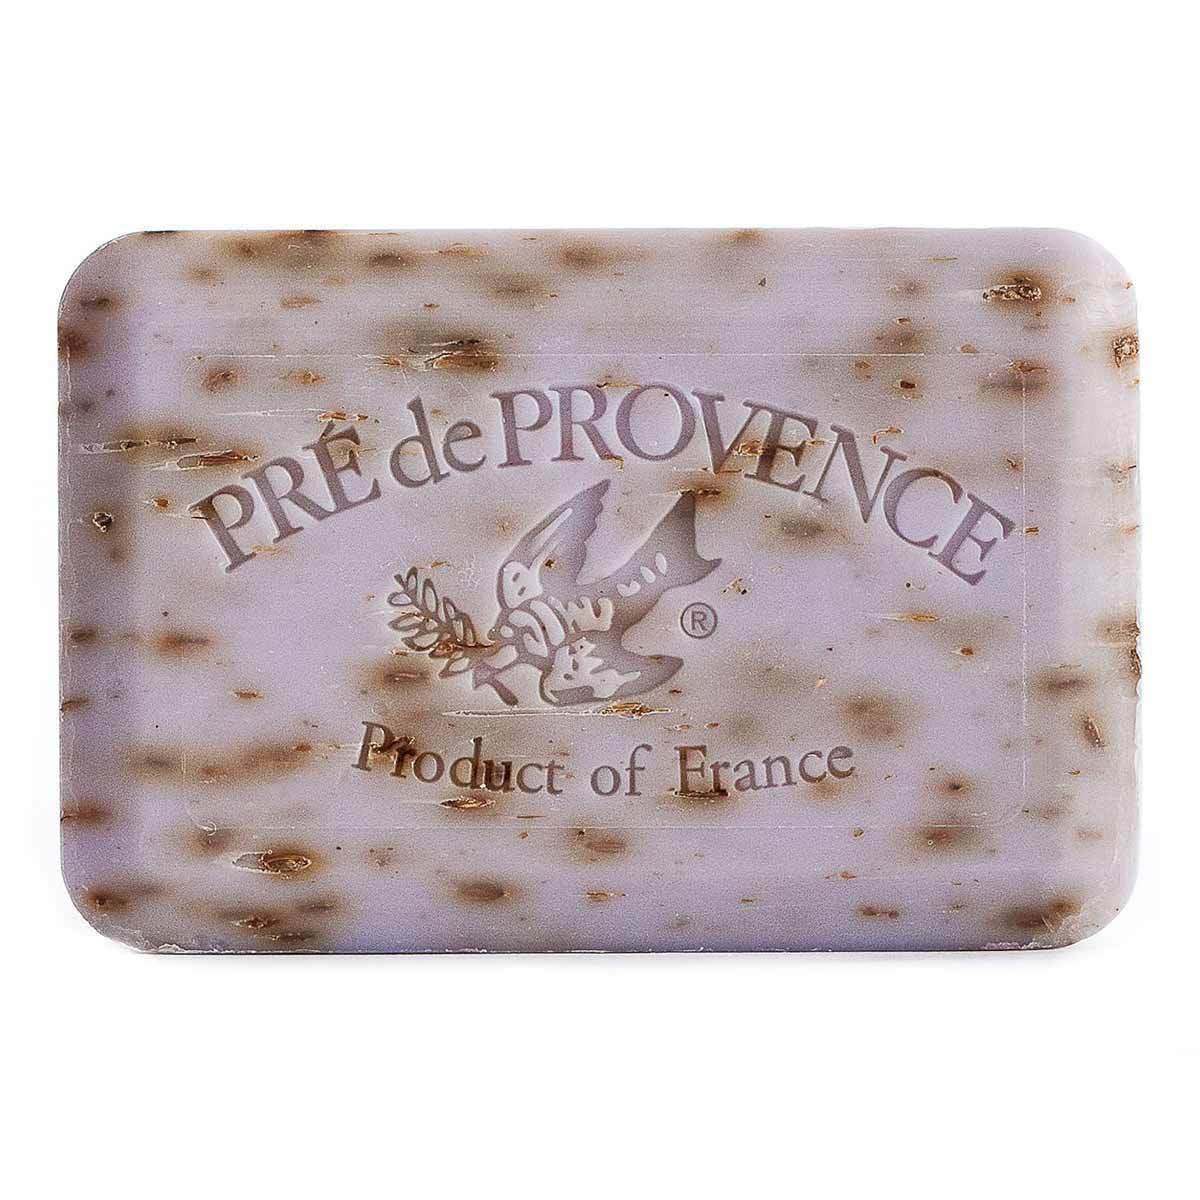 Pre De Provence 150 Gram Soap Bar - Lavender